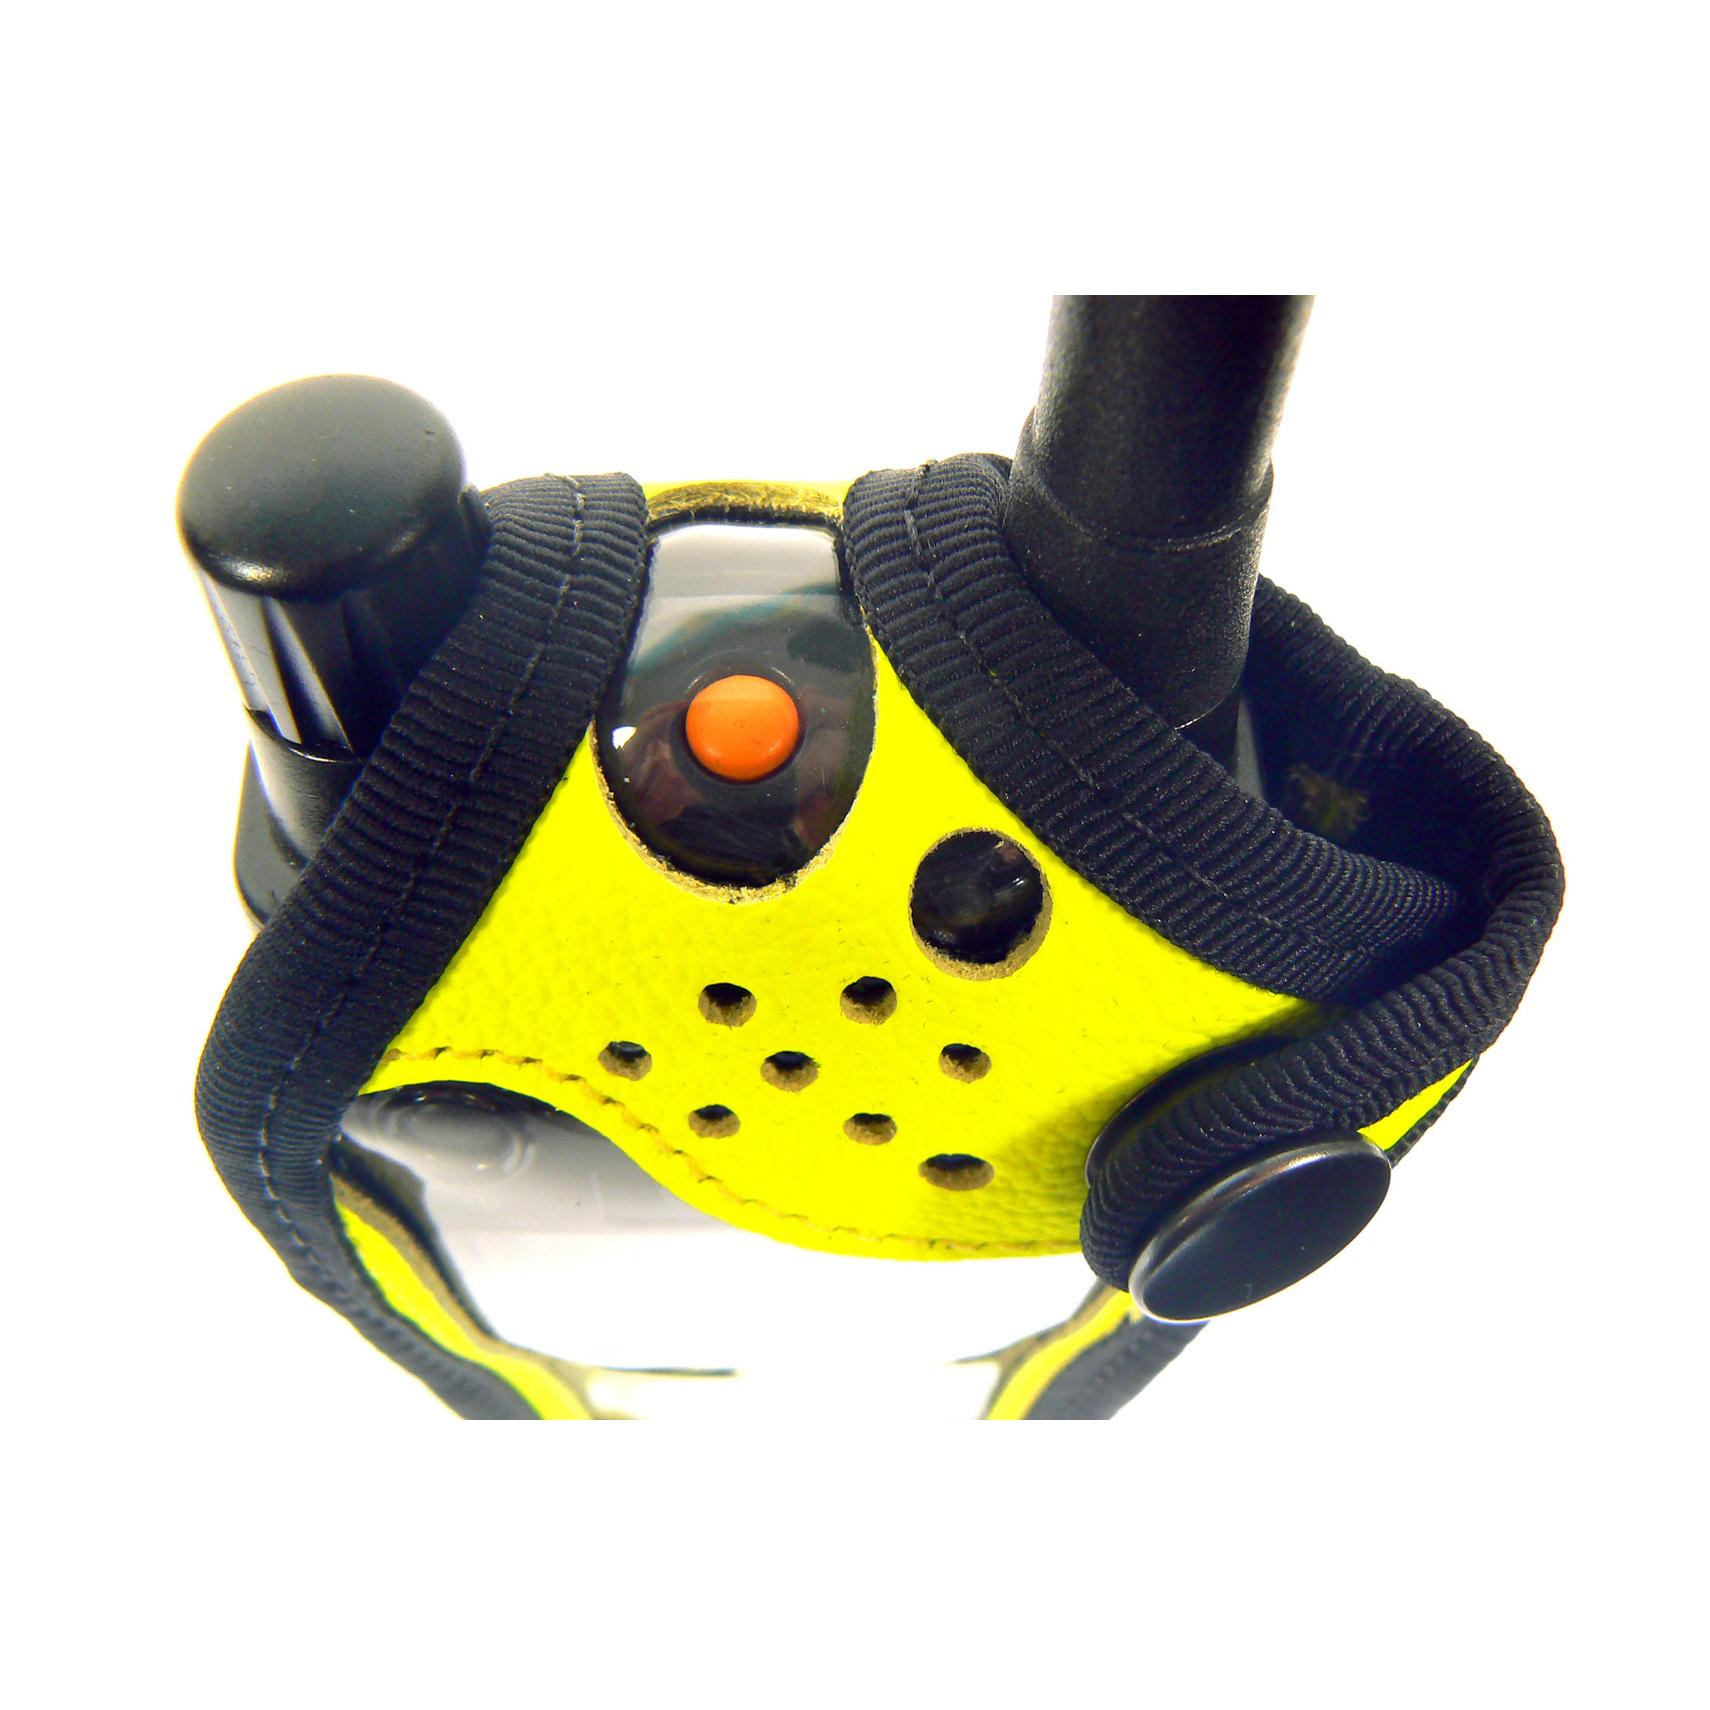 Sepura SRP9000 Tetra Radio Case Hi-Vis Yellow Leather with Click-On